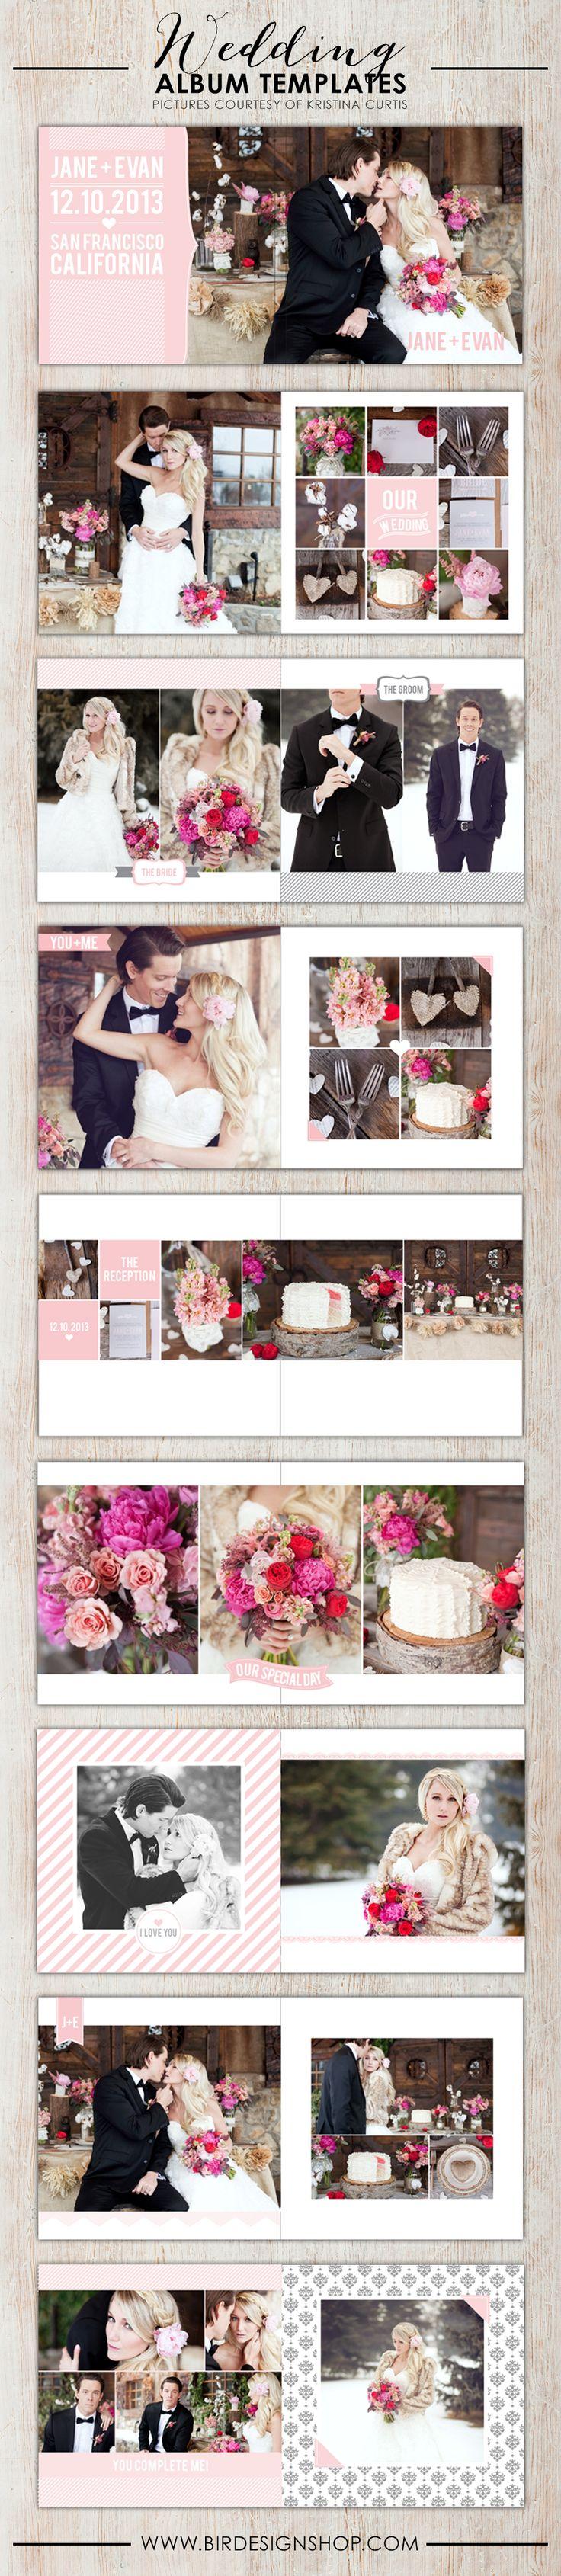 Photoshop wedding album templates